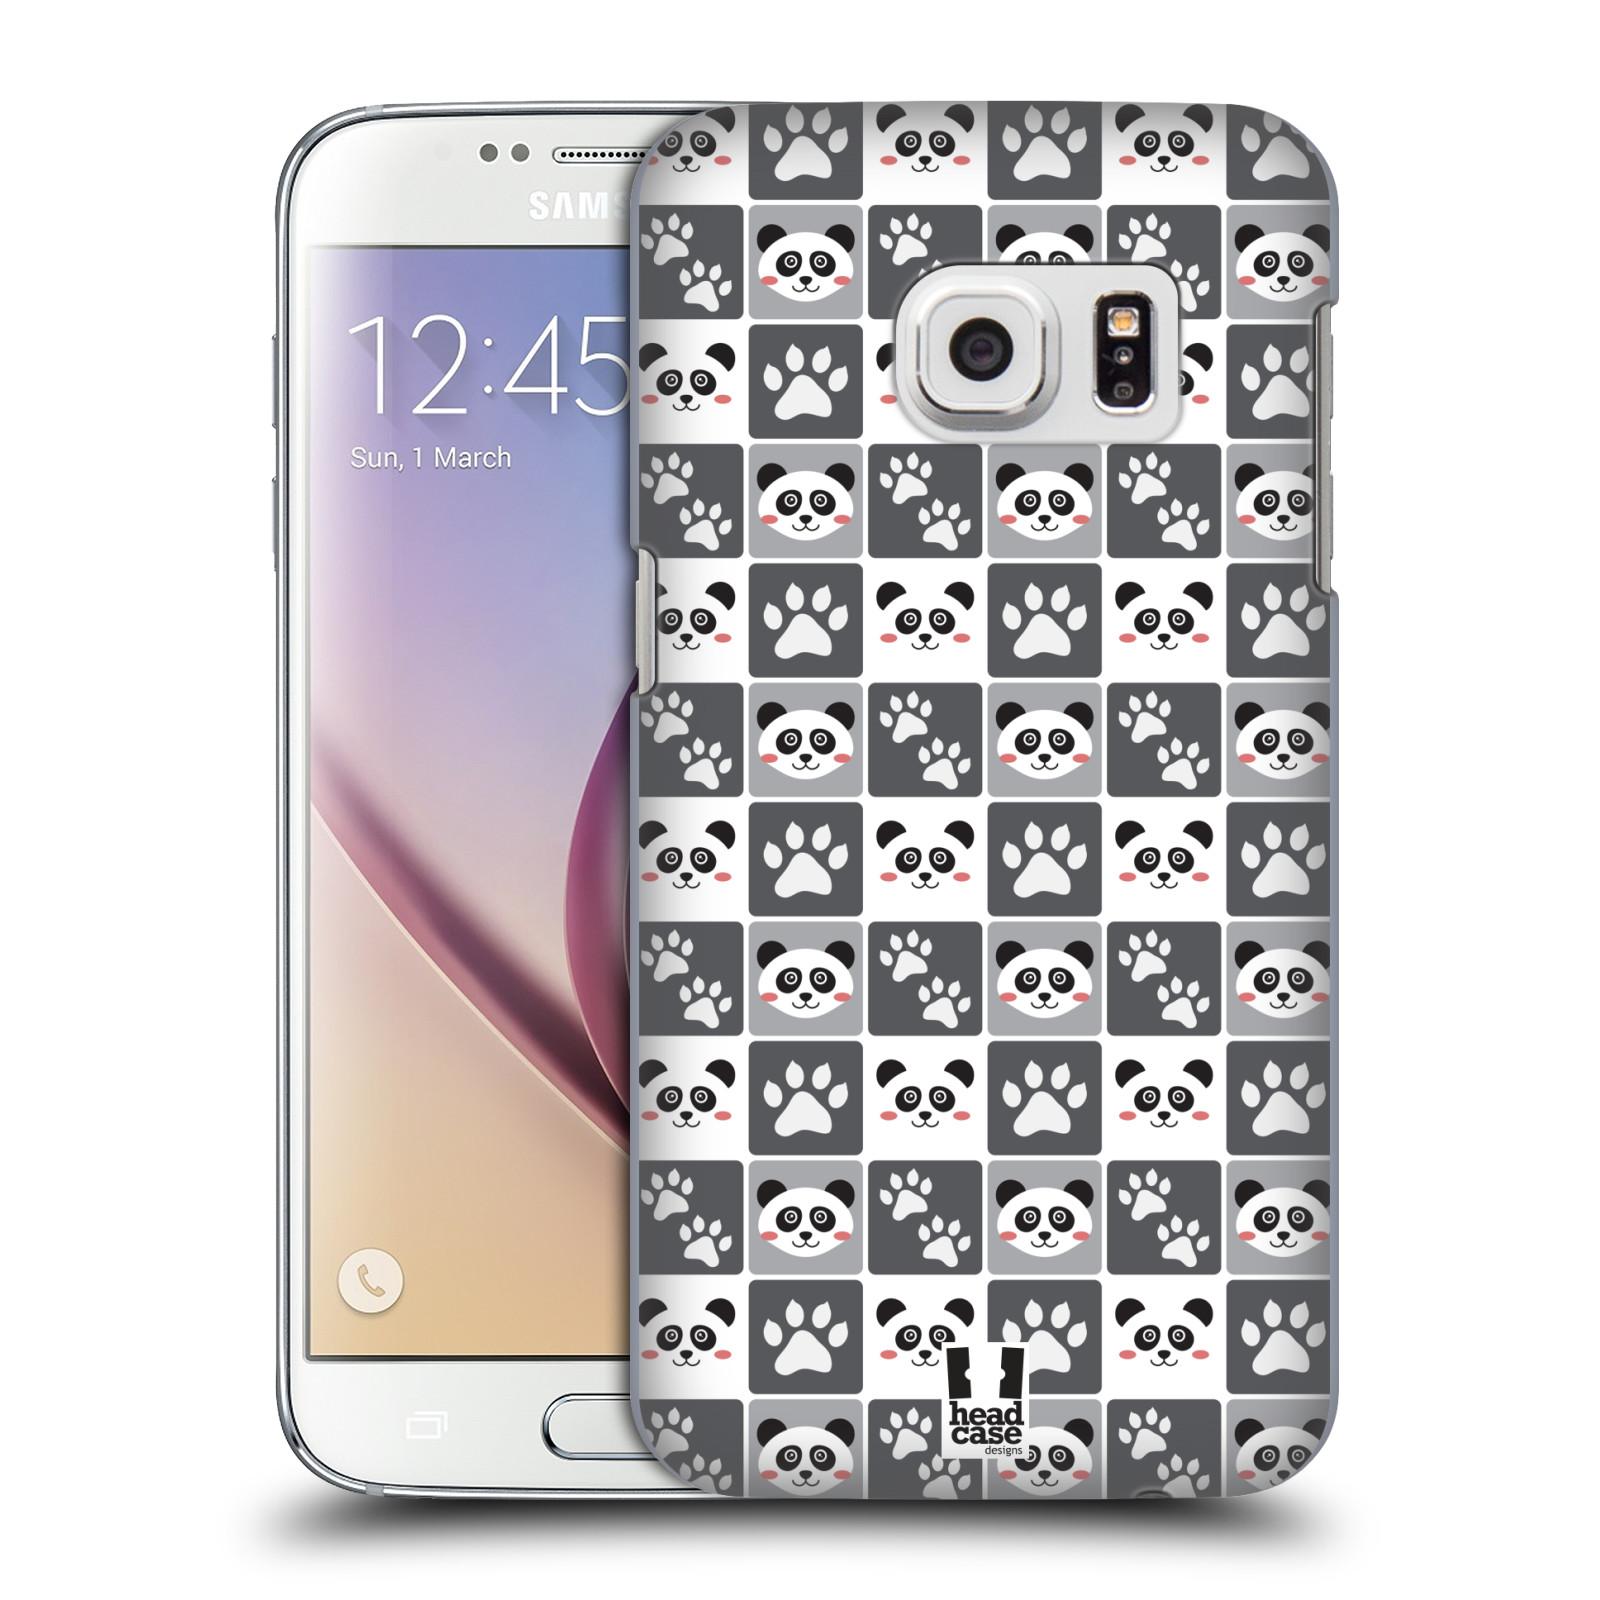 HEAD CASE plastový obal na mobil SAMSUNG GALAXY S7 vzor Zvířecí razítka MEDVÍDEK PANDA